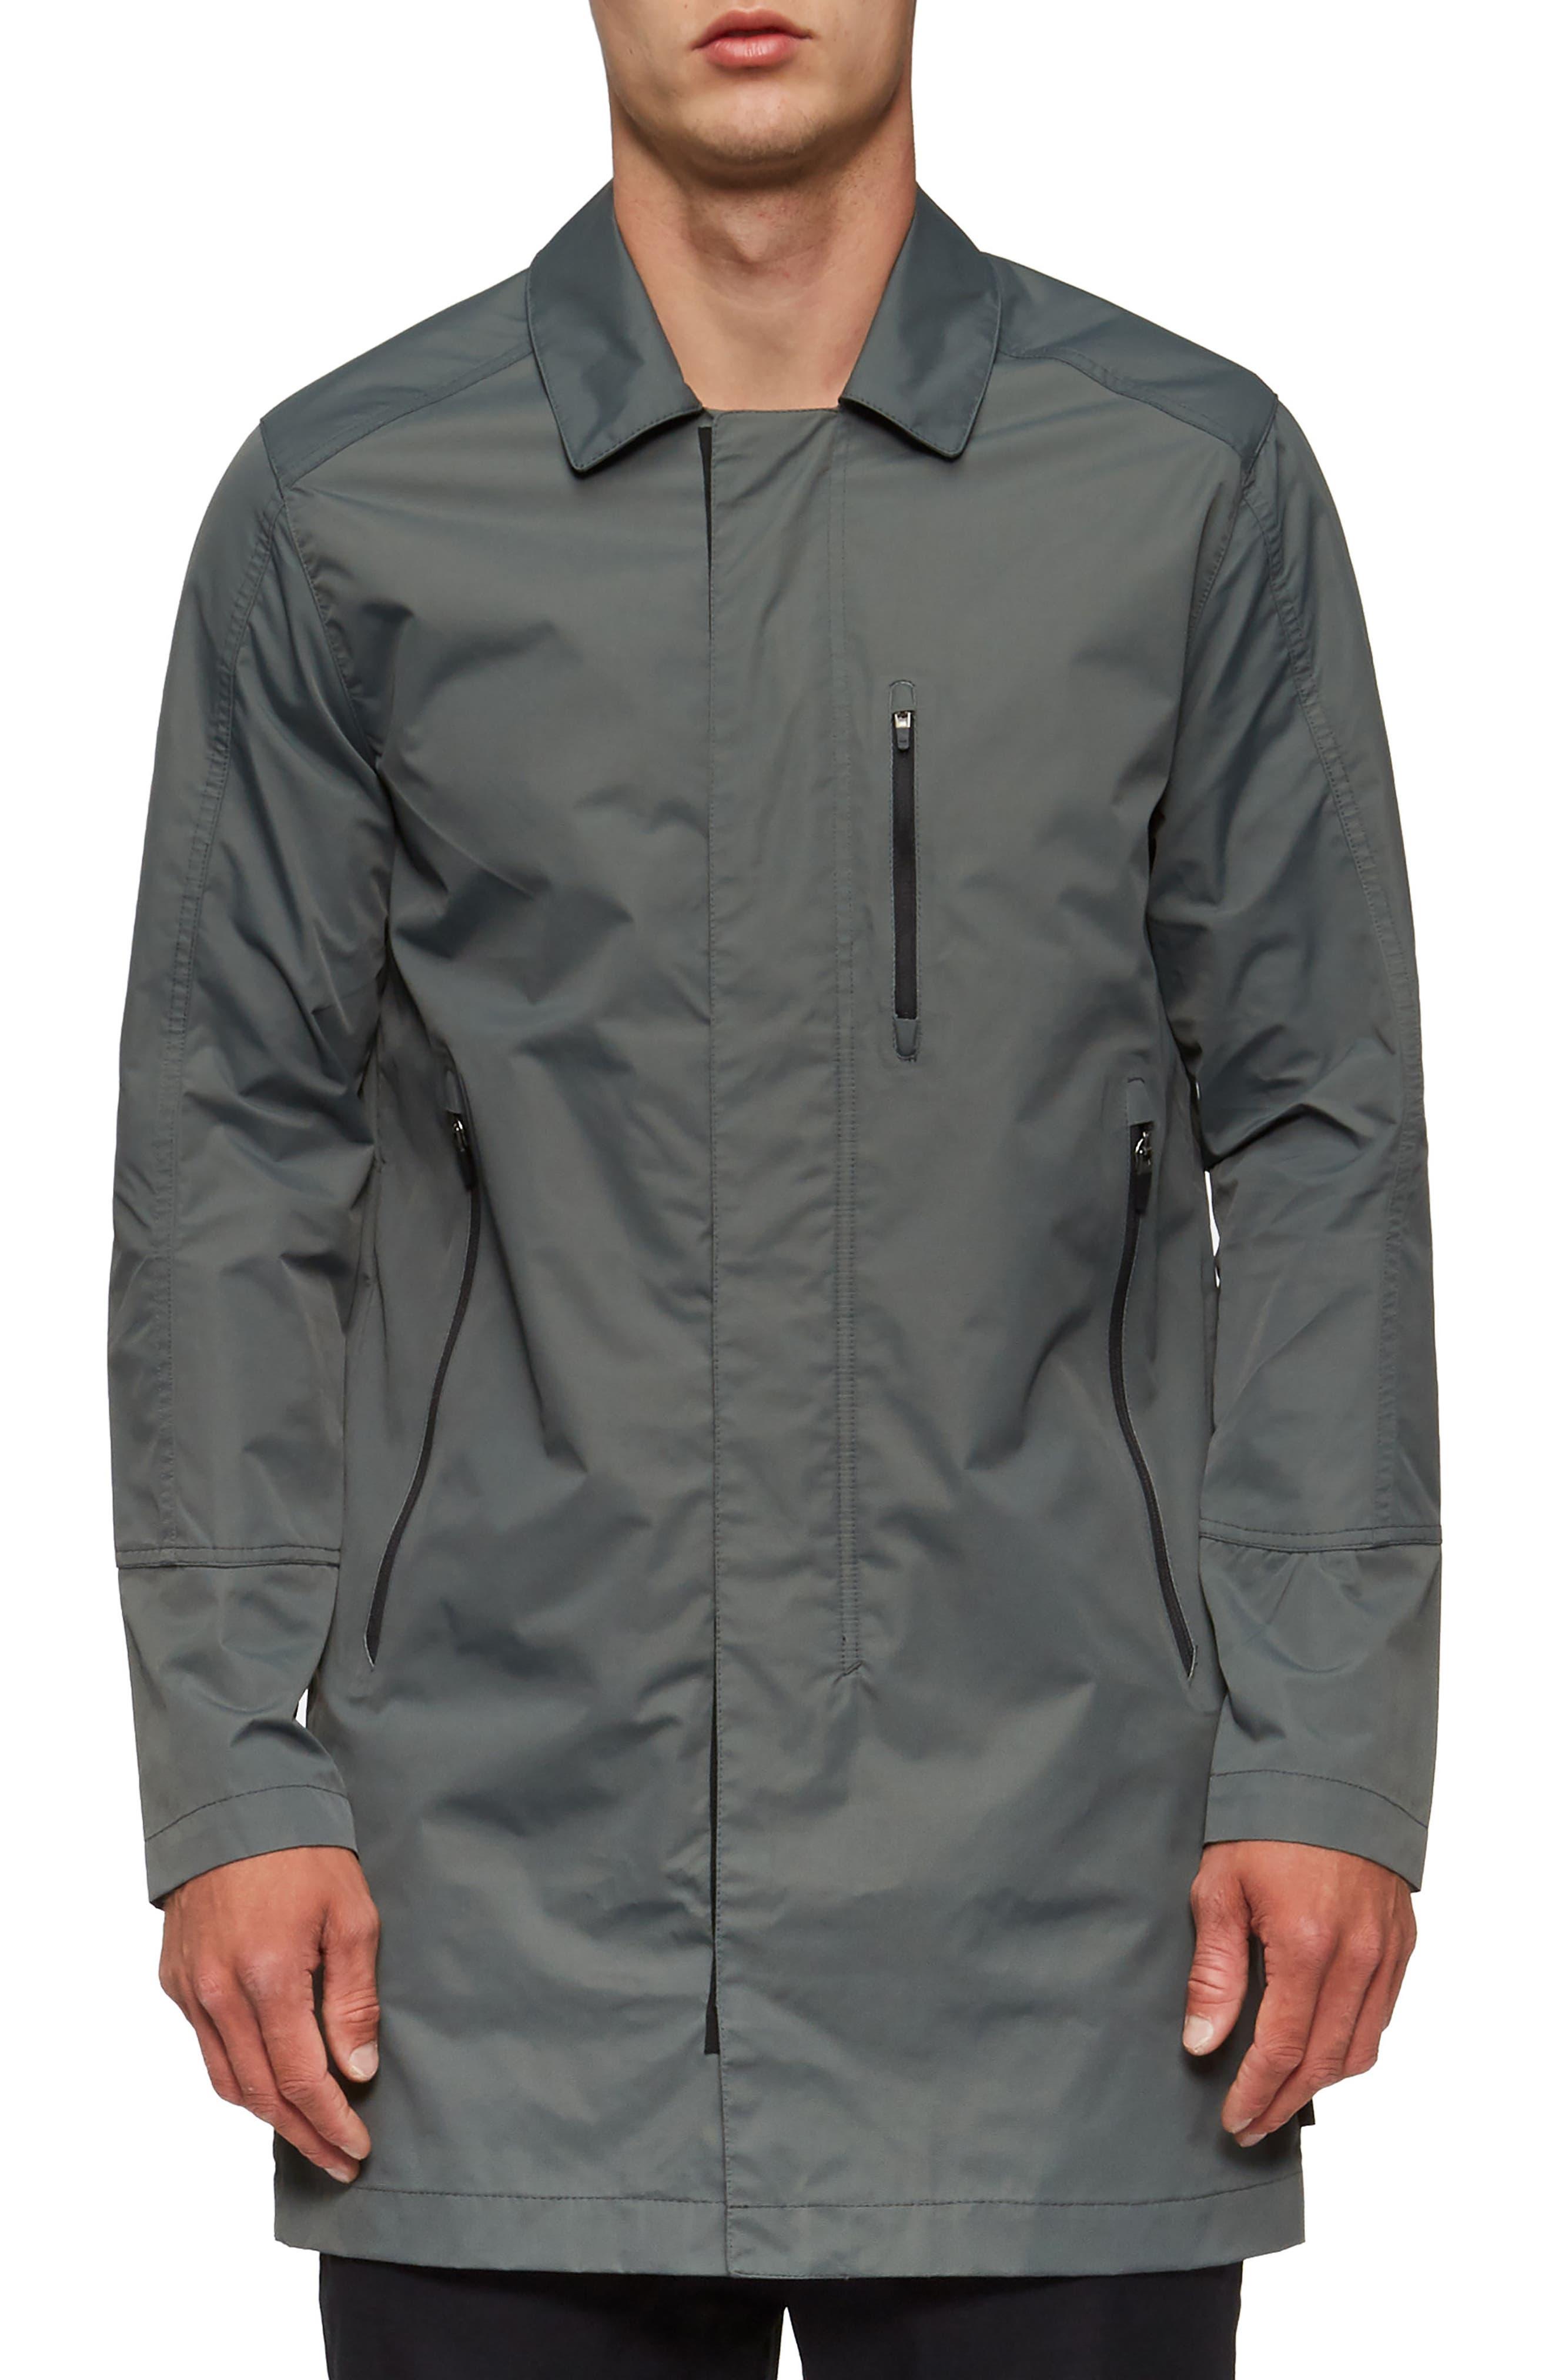 Deckard Weather Resistant Trench Coat,                         Main,                         color, 307